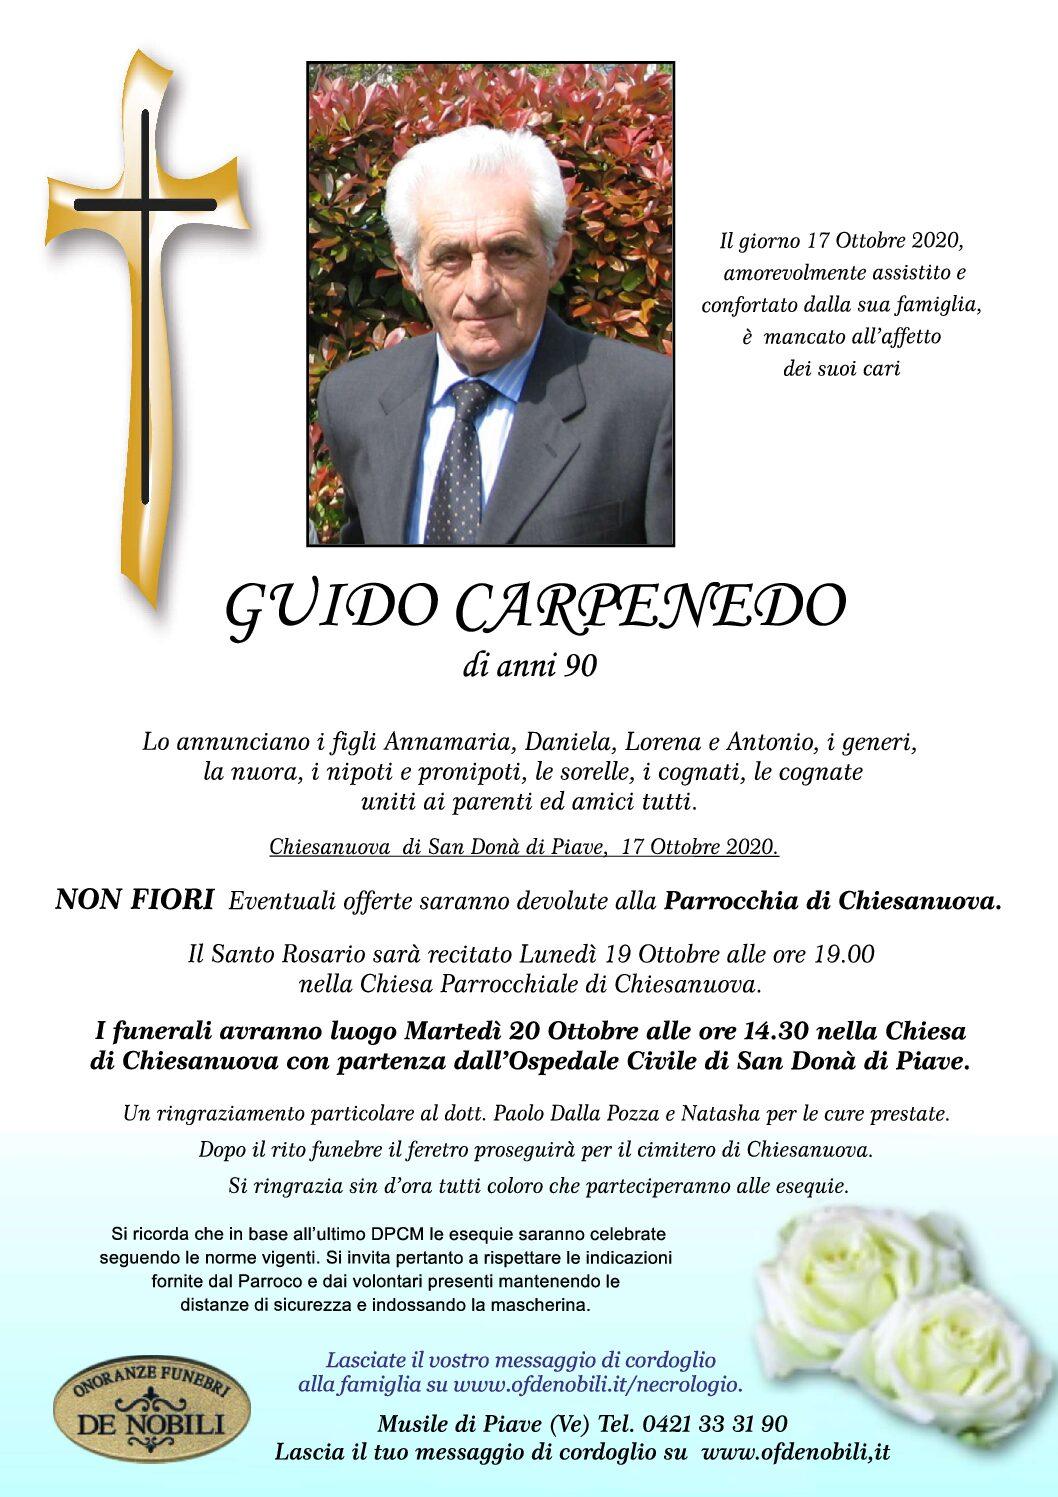 Guido Carpenedo